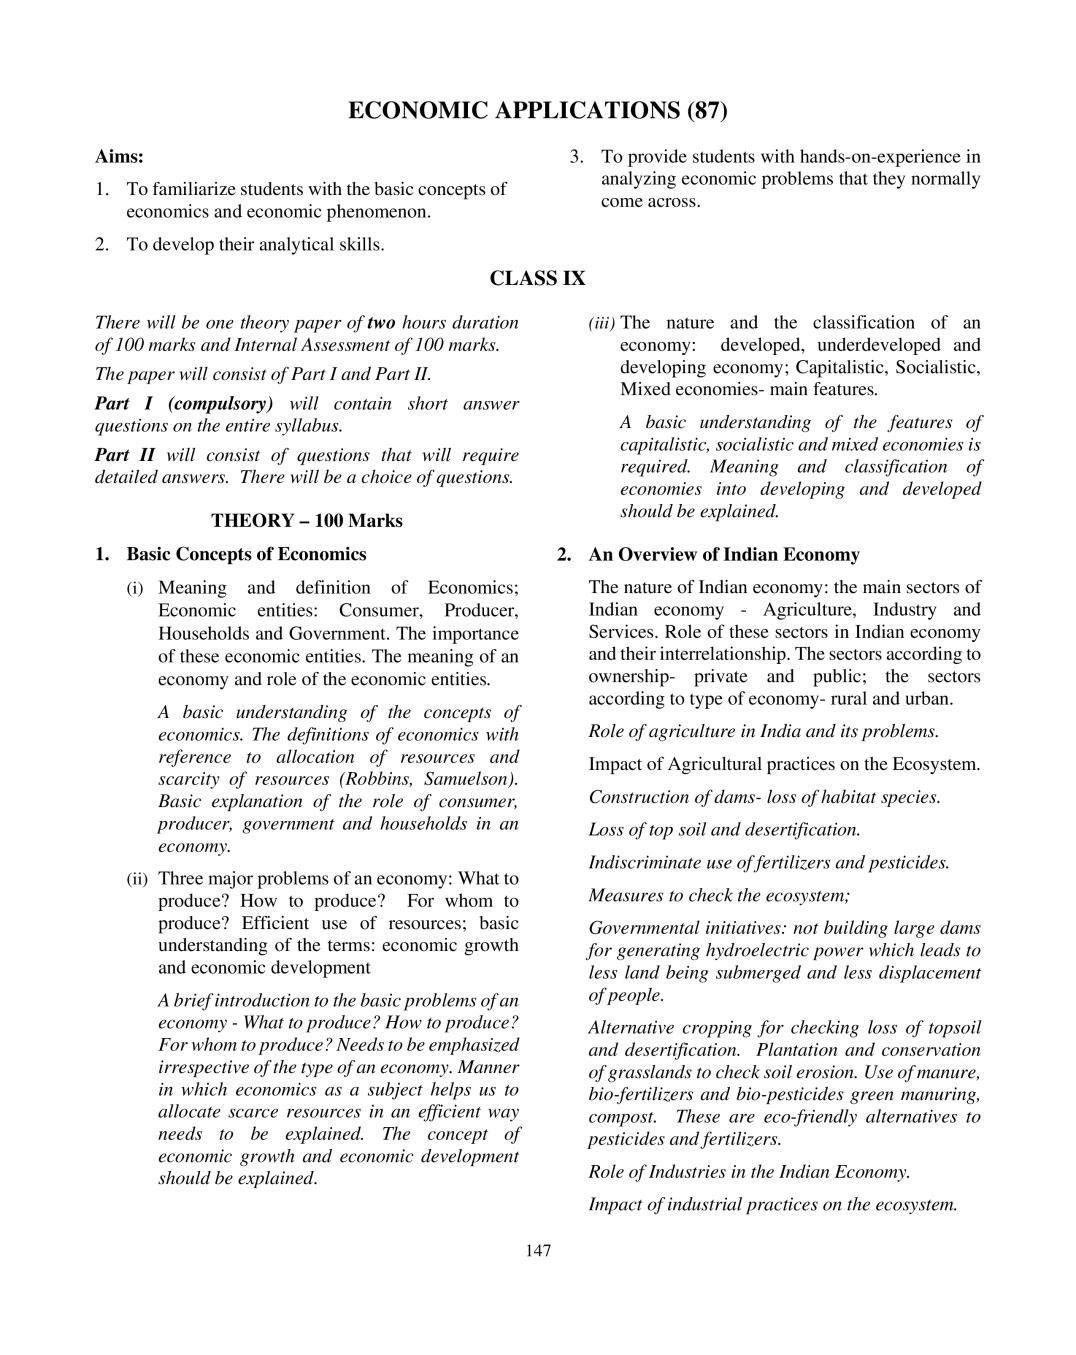 ICSE Class 10 Economic Applications Syllabus 2020 - Page 1